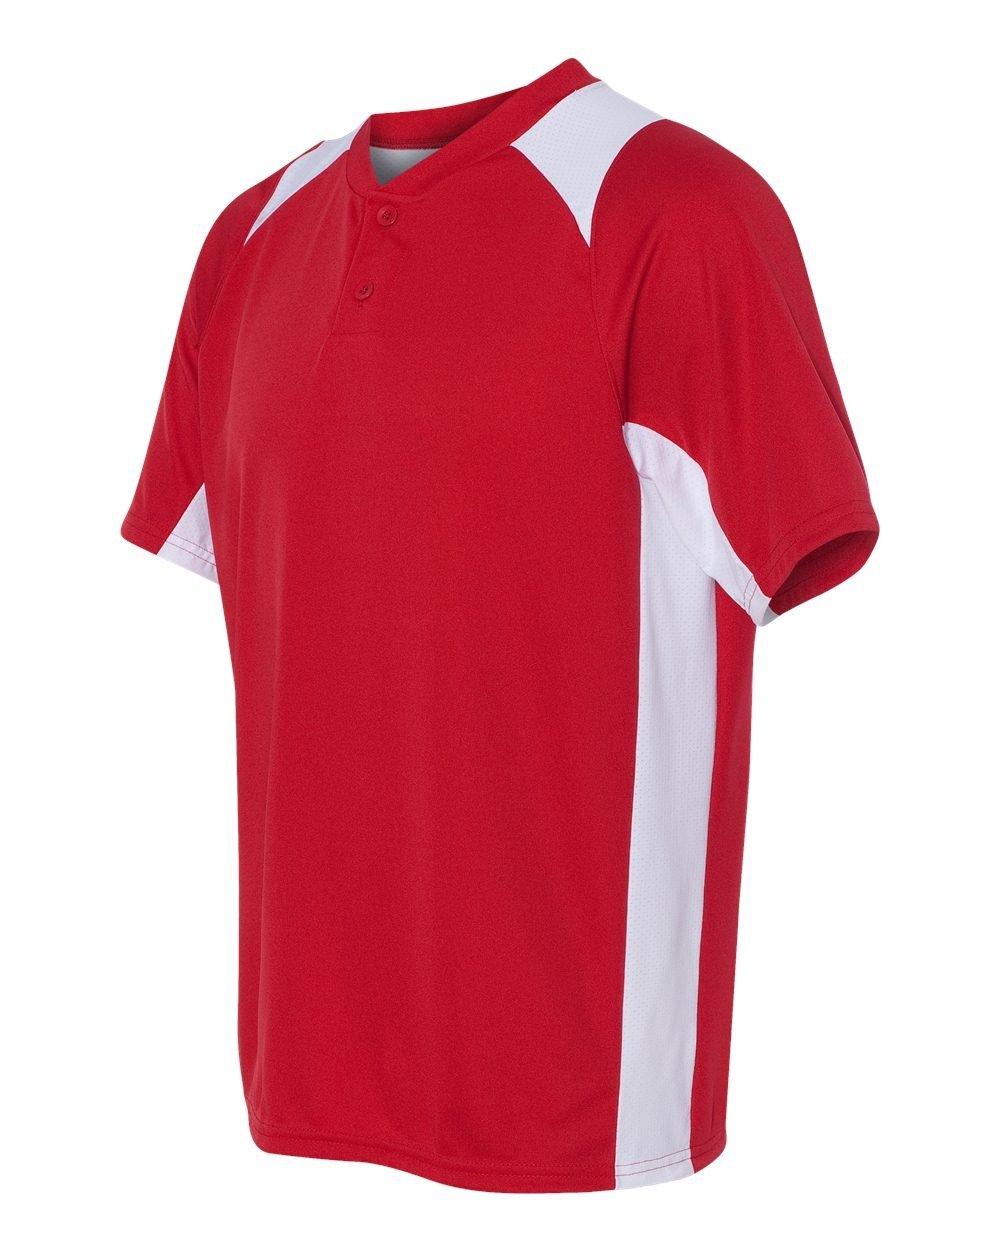 Augusta SportswearメンズGamer野球ジャージー B00DOFQRIC Medium|レッド/ホワイト レッド/ホワイト Medium